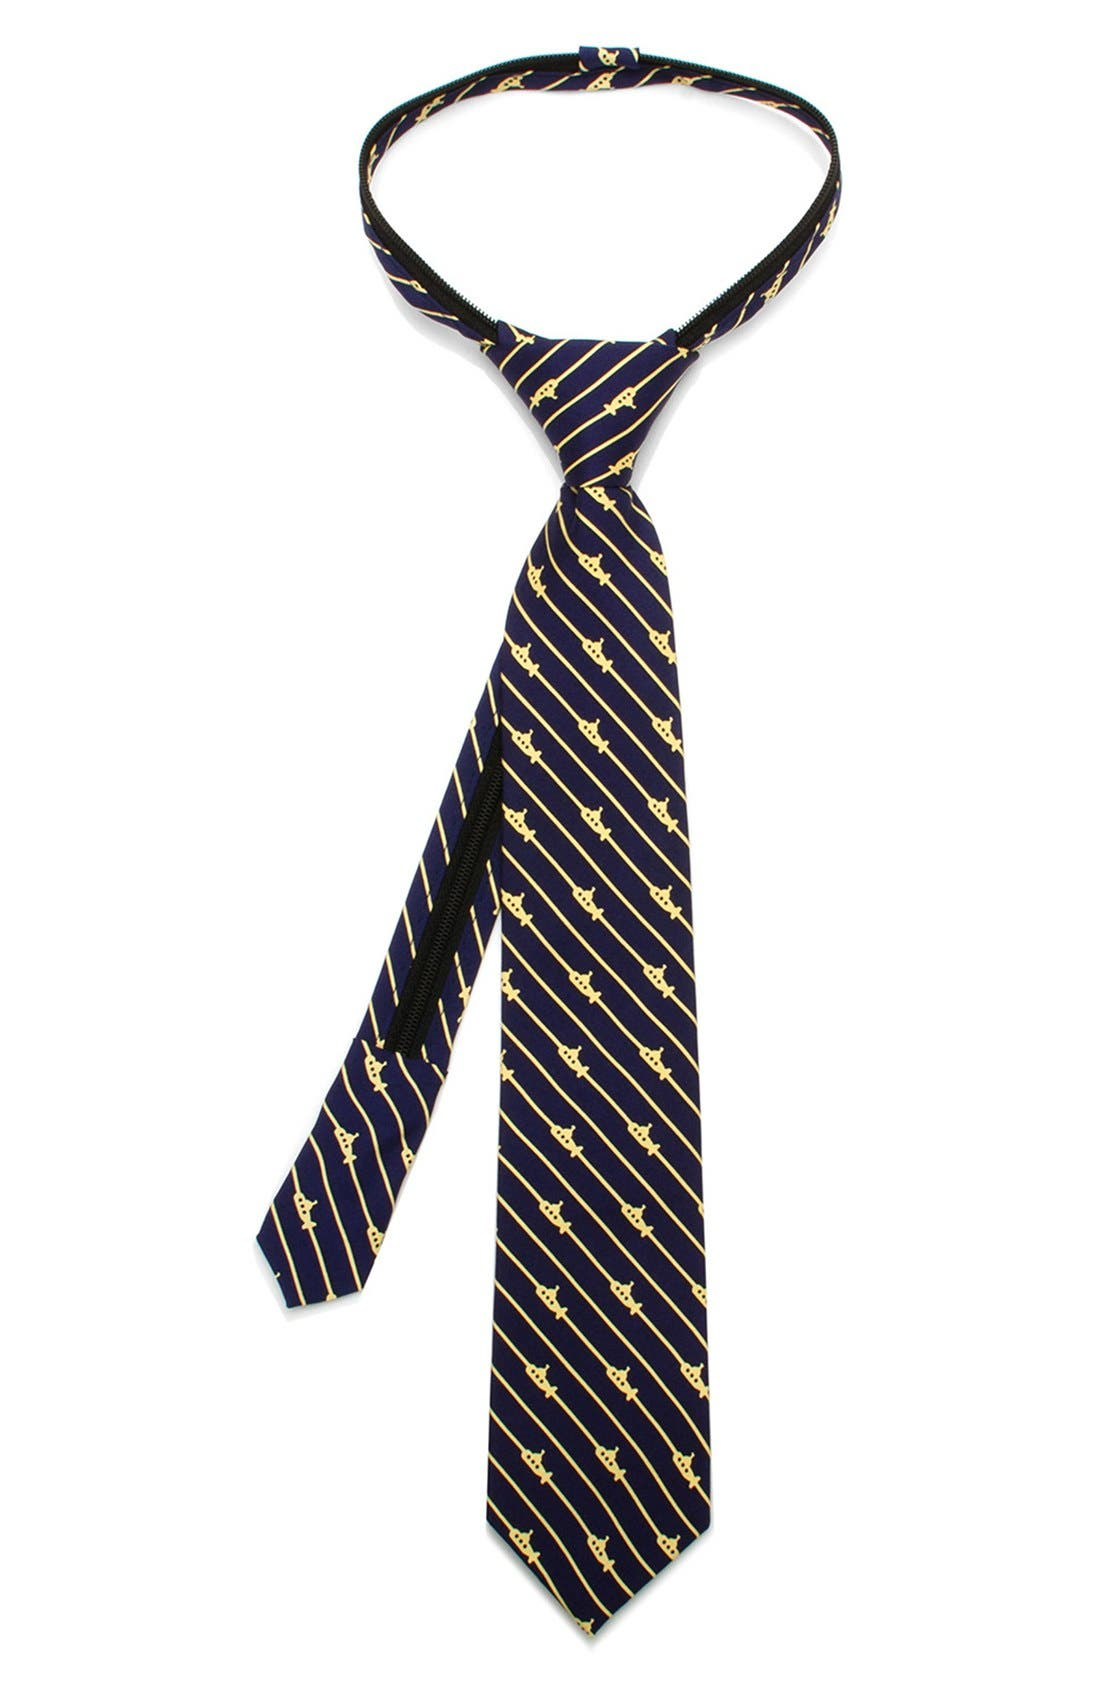 Ox and Bull Trading Co. 'Submarine Stripe' ZipperSilk Tie (Little Boys)